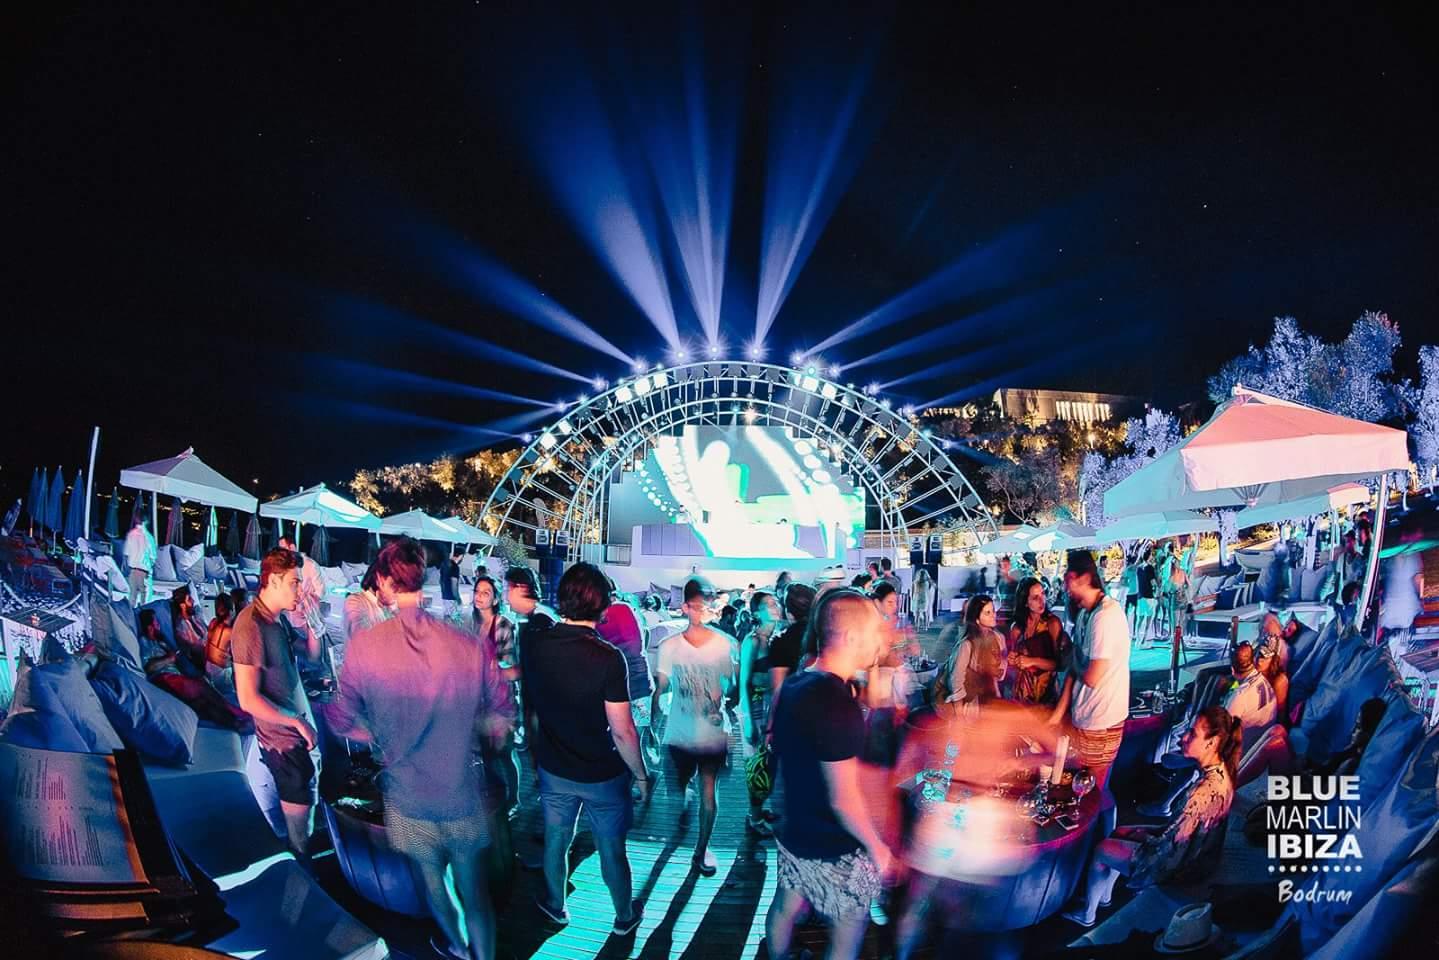 BLUE MARLIN IBIZA GOES GLOBAL  Blue Marlin Ibiza  Beach